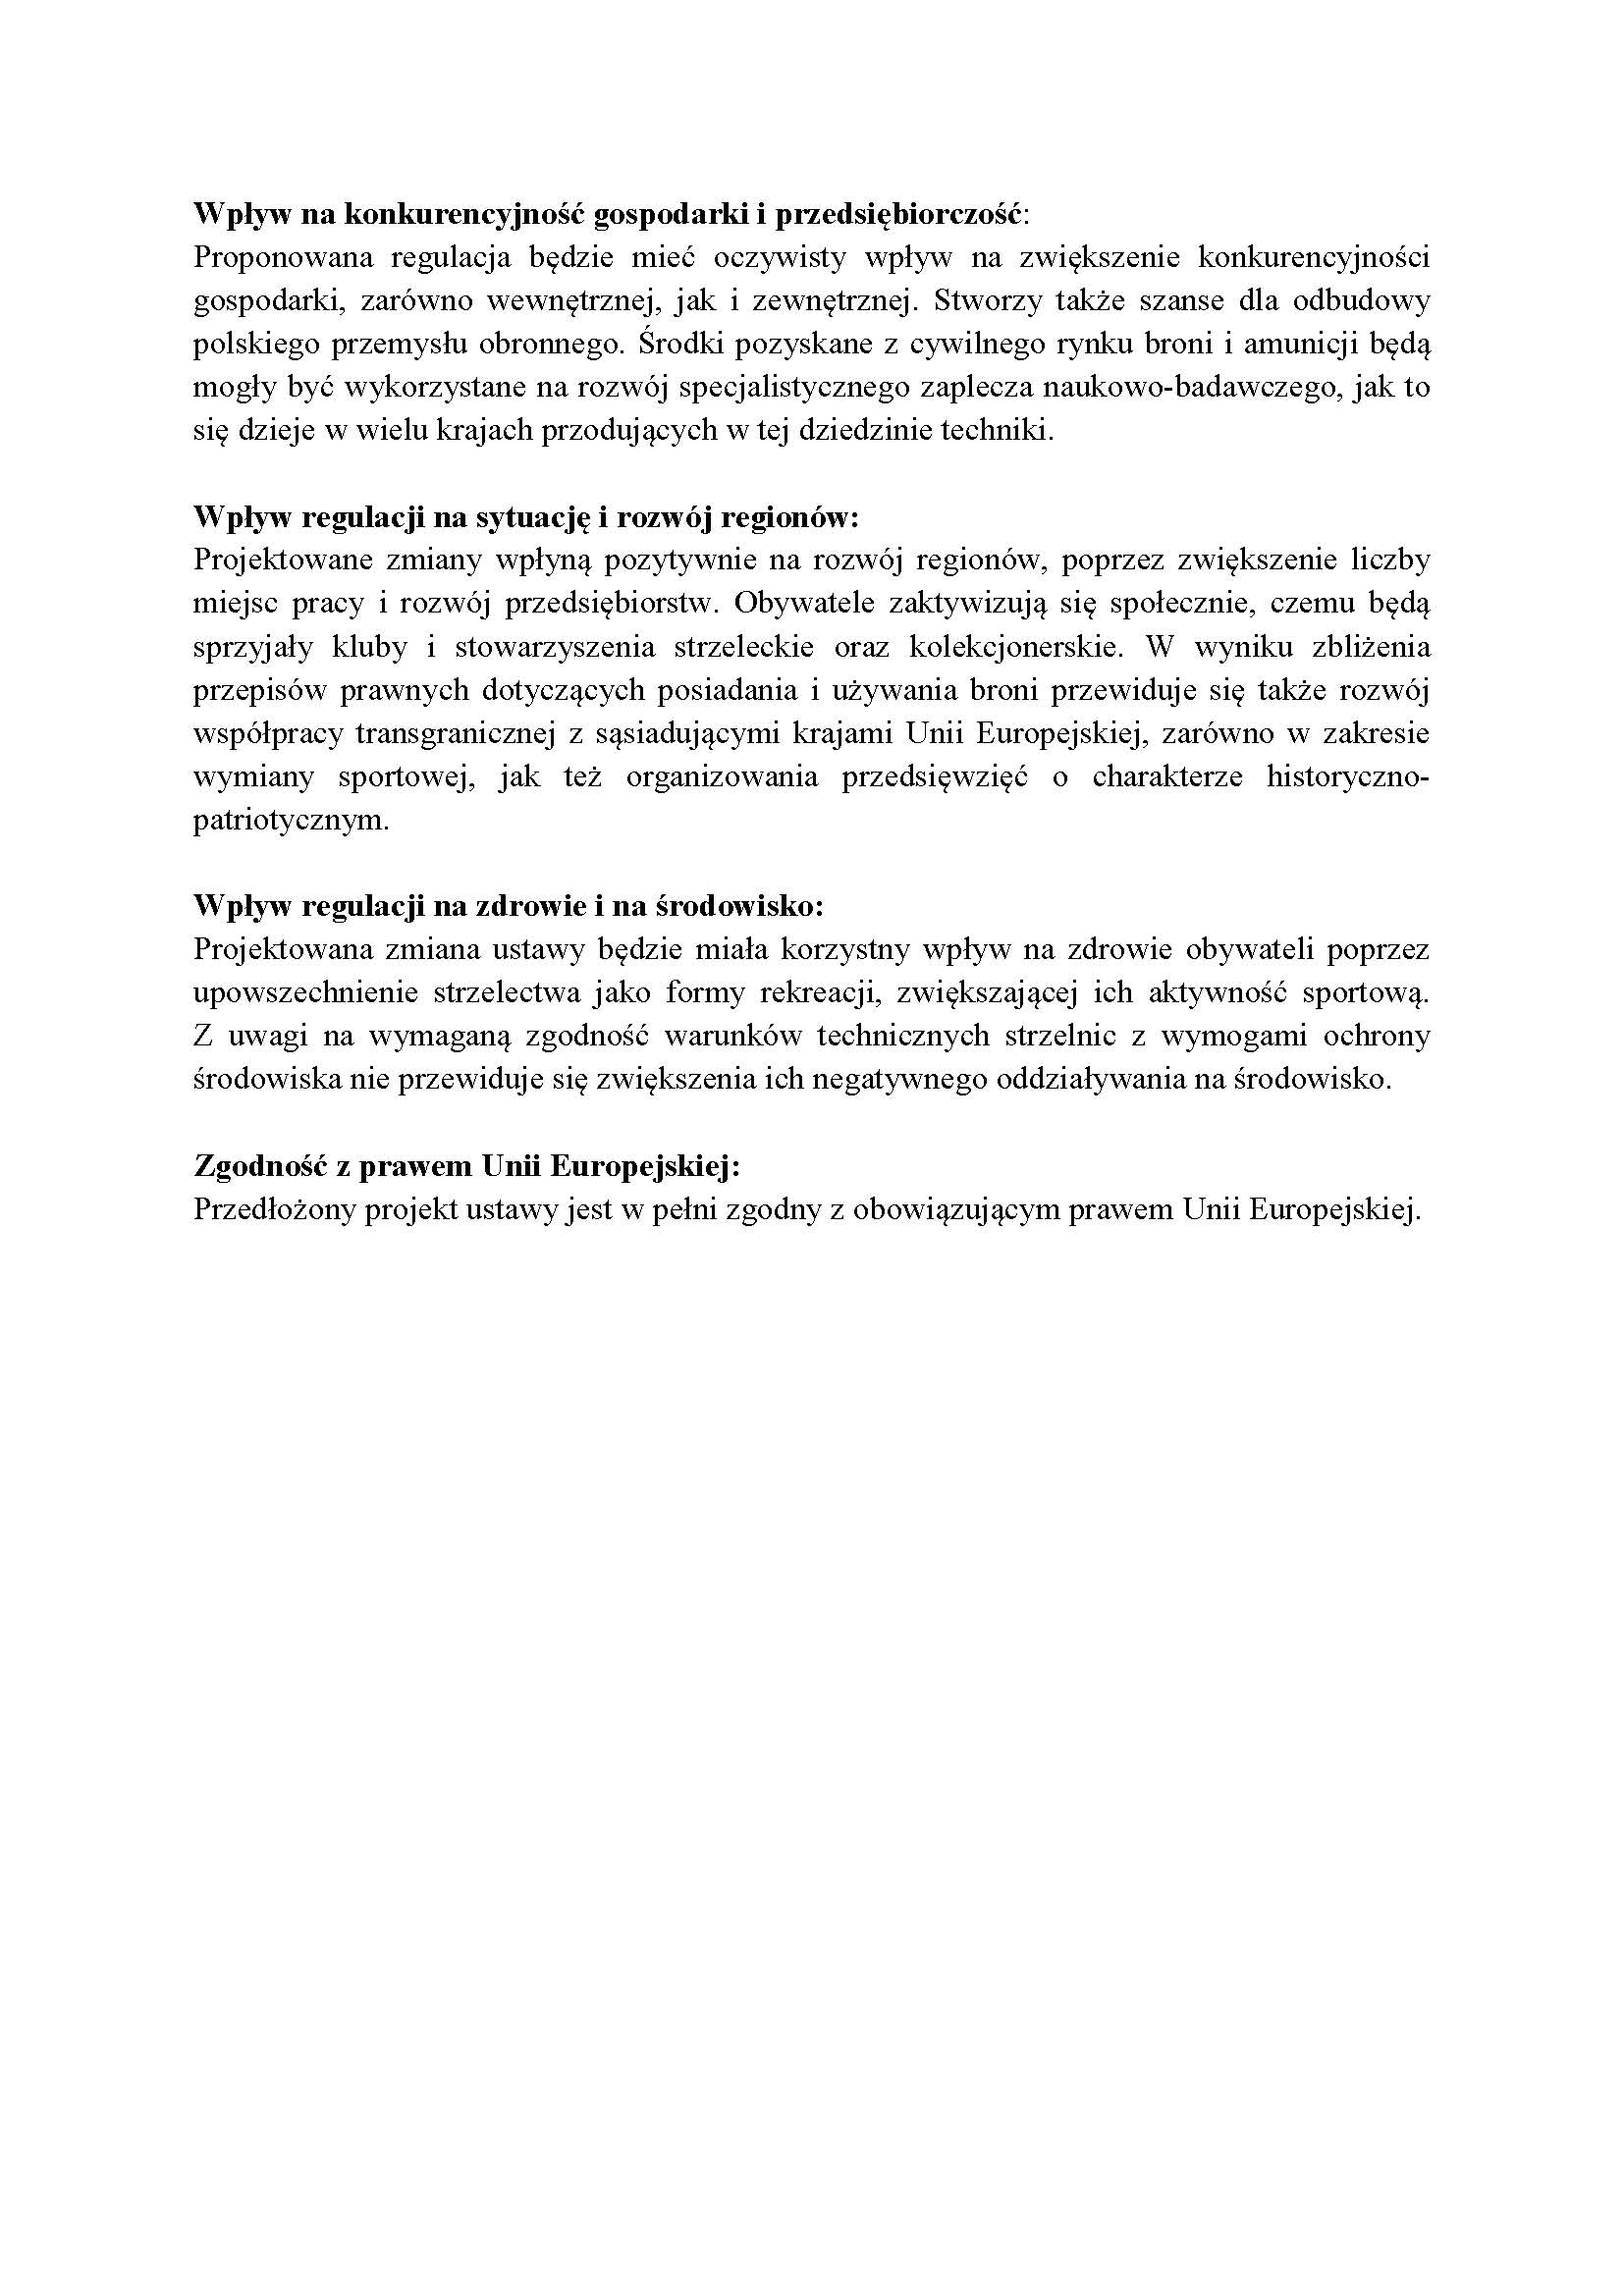 FRSwP_projekt_ustawy_20151125_Strona_32